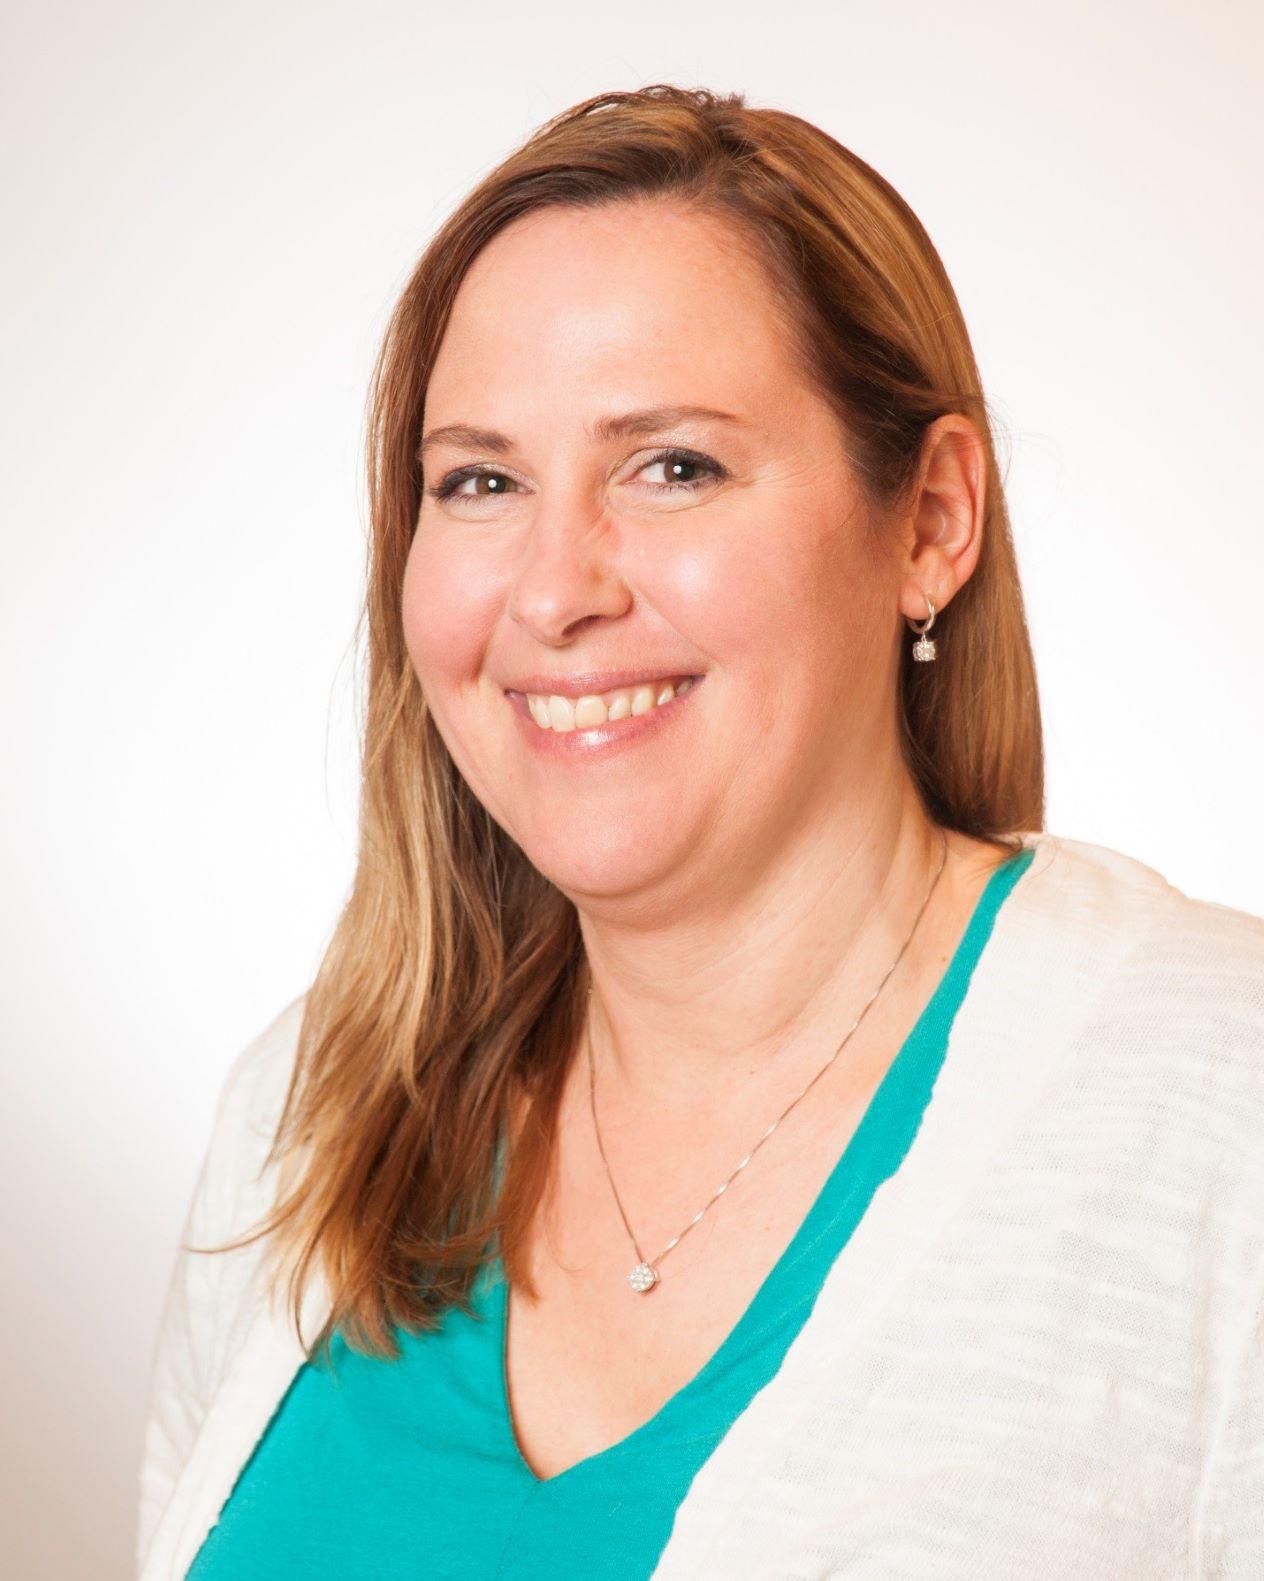 headshot of Sarah Sederstrom